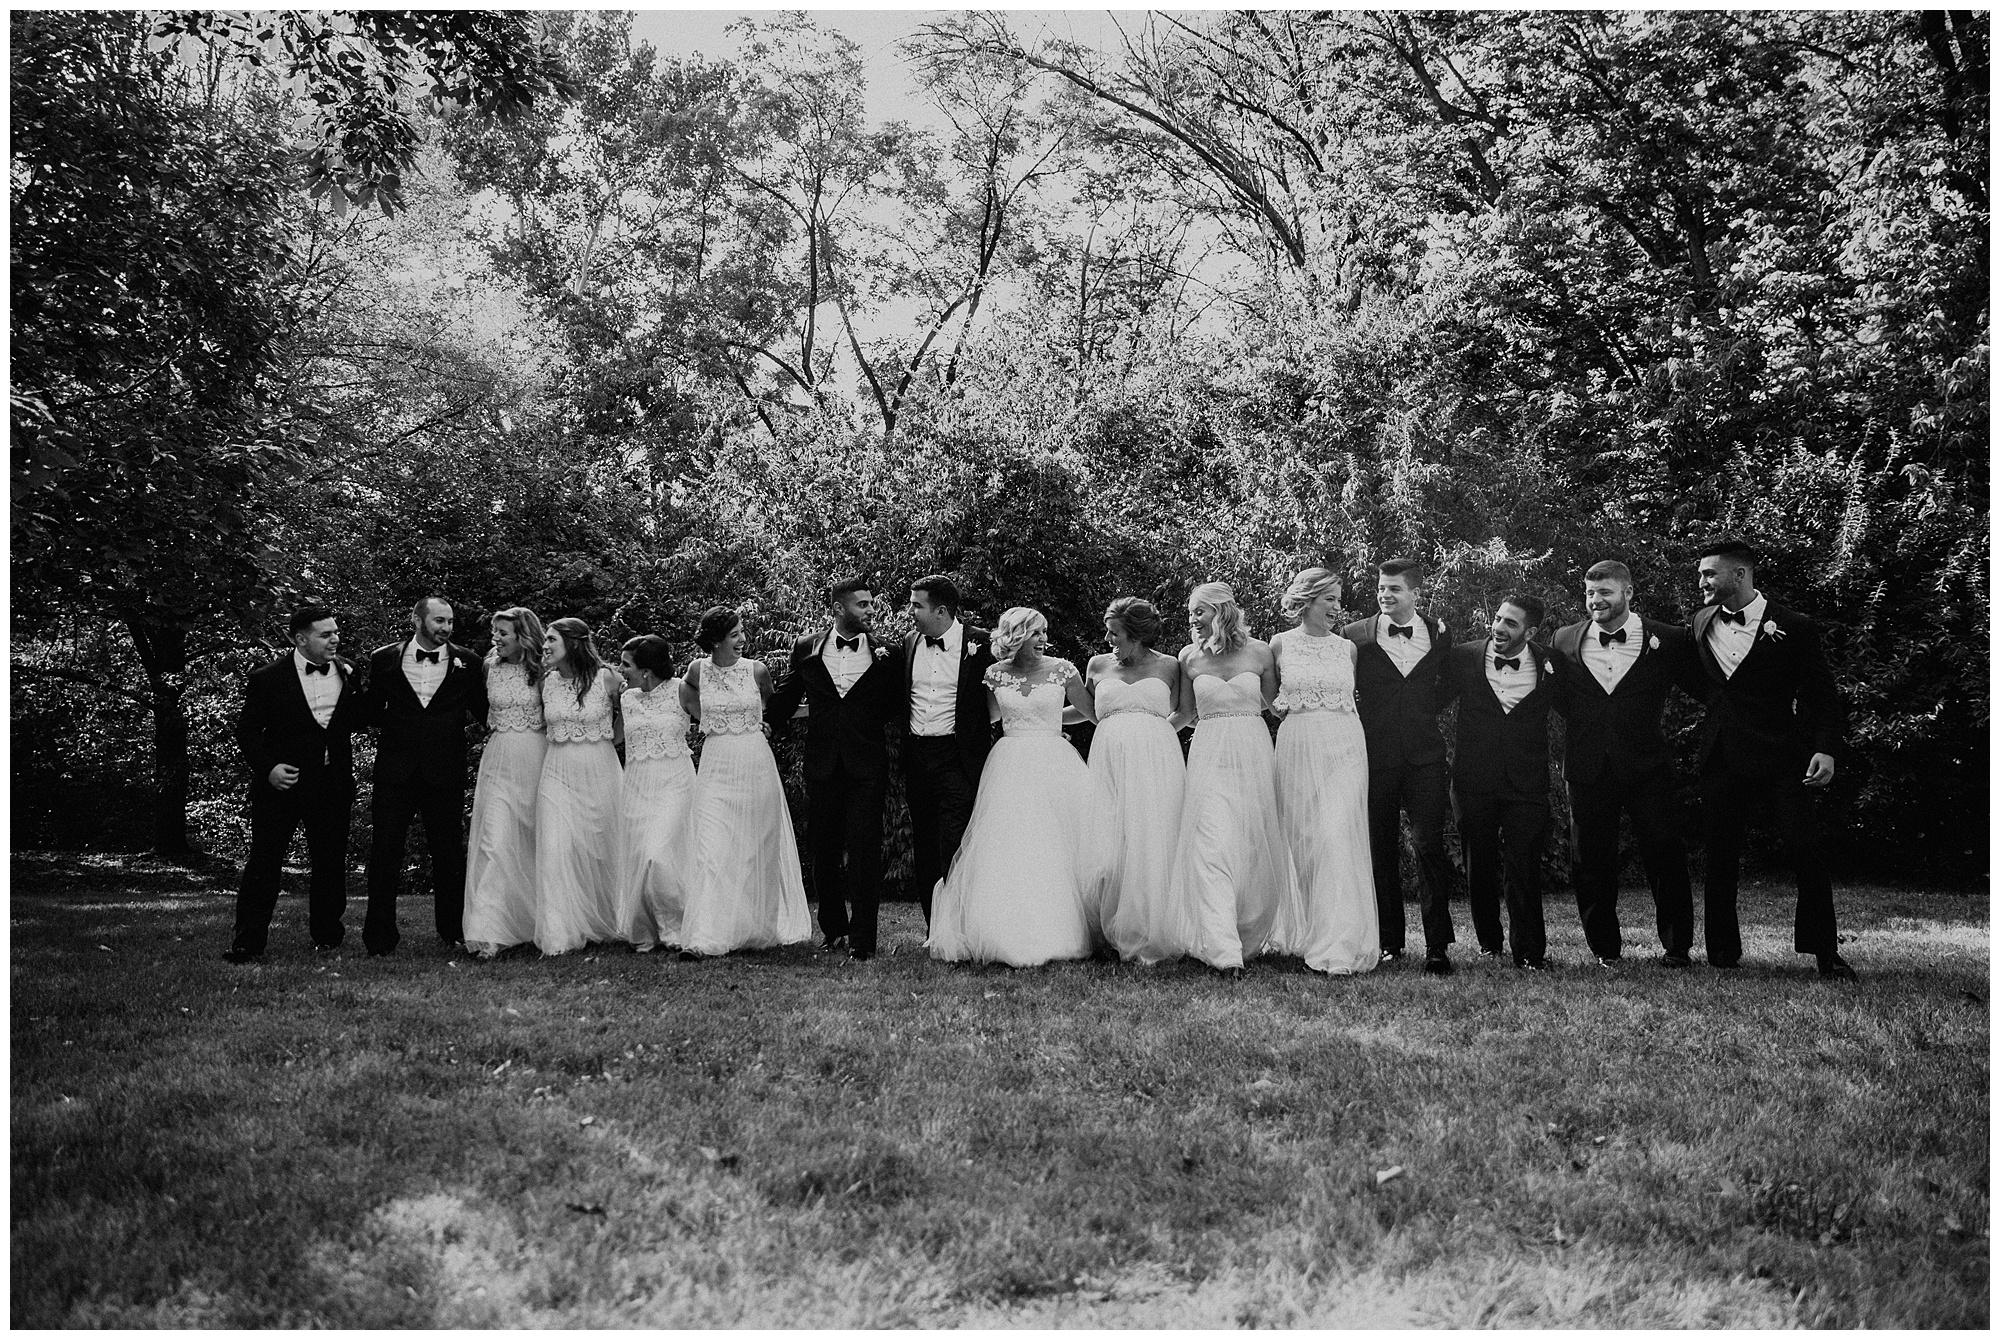 pear_tree_estate_wedding_champaign_il_wright_photographs_jj_0044.jpg